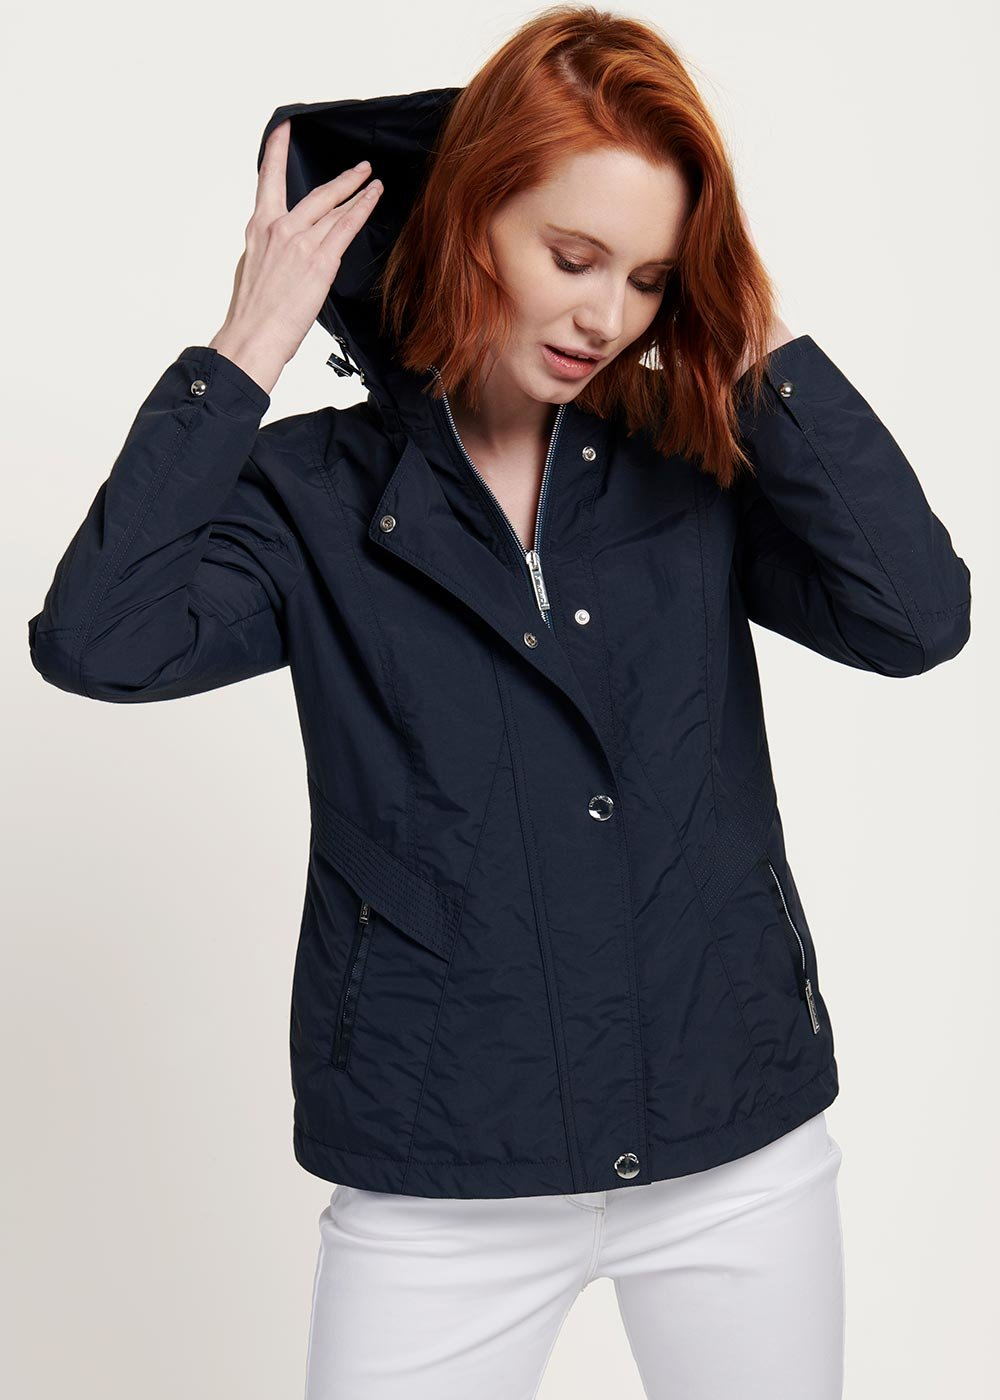 Gael cotton jacket with hood - Medium Blue - Woman